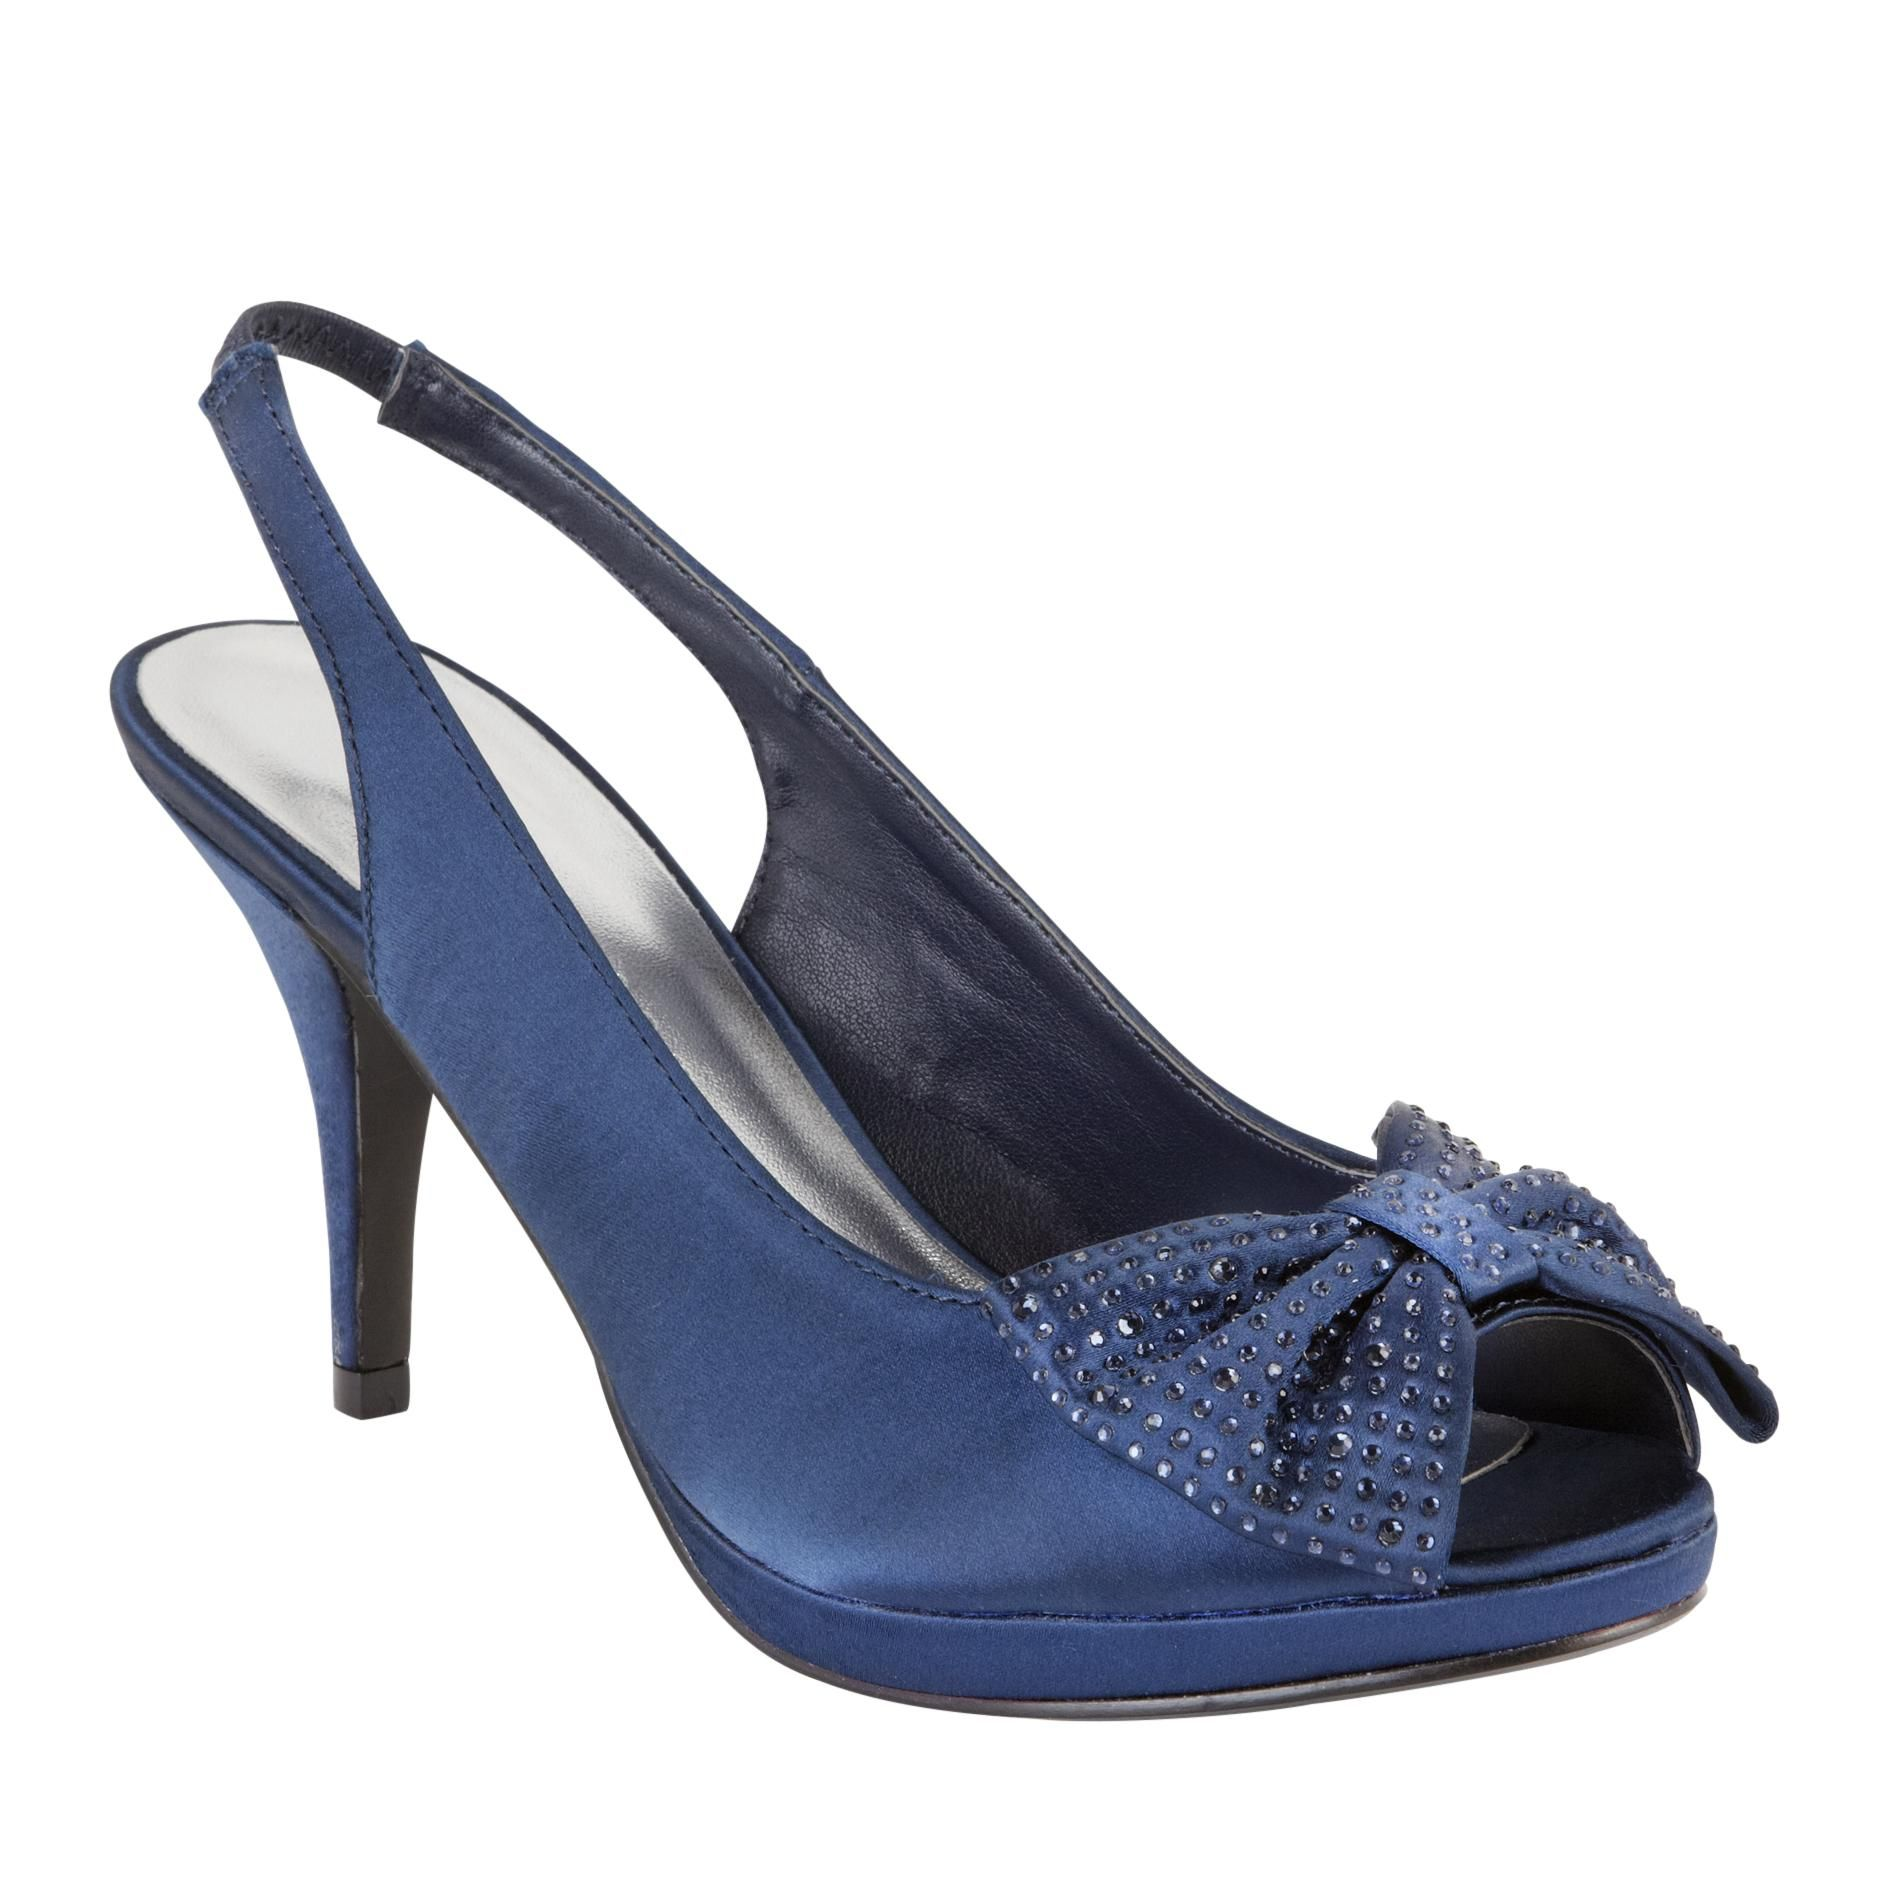 Metaphor womenus dress shoe keira navyshoeswomens shoeswomens